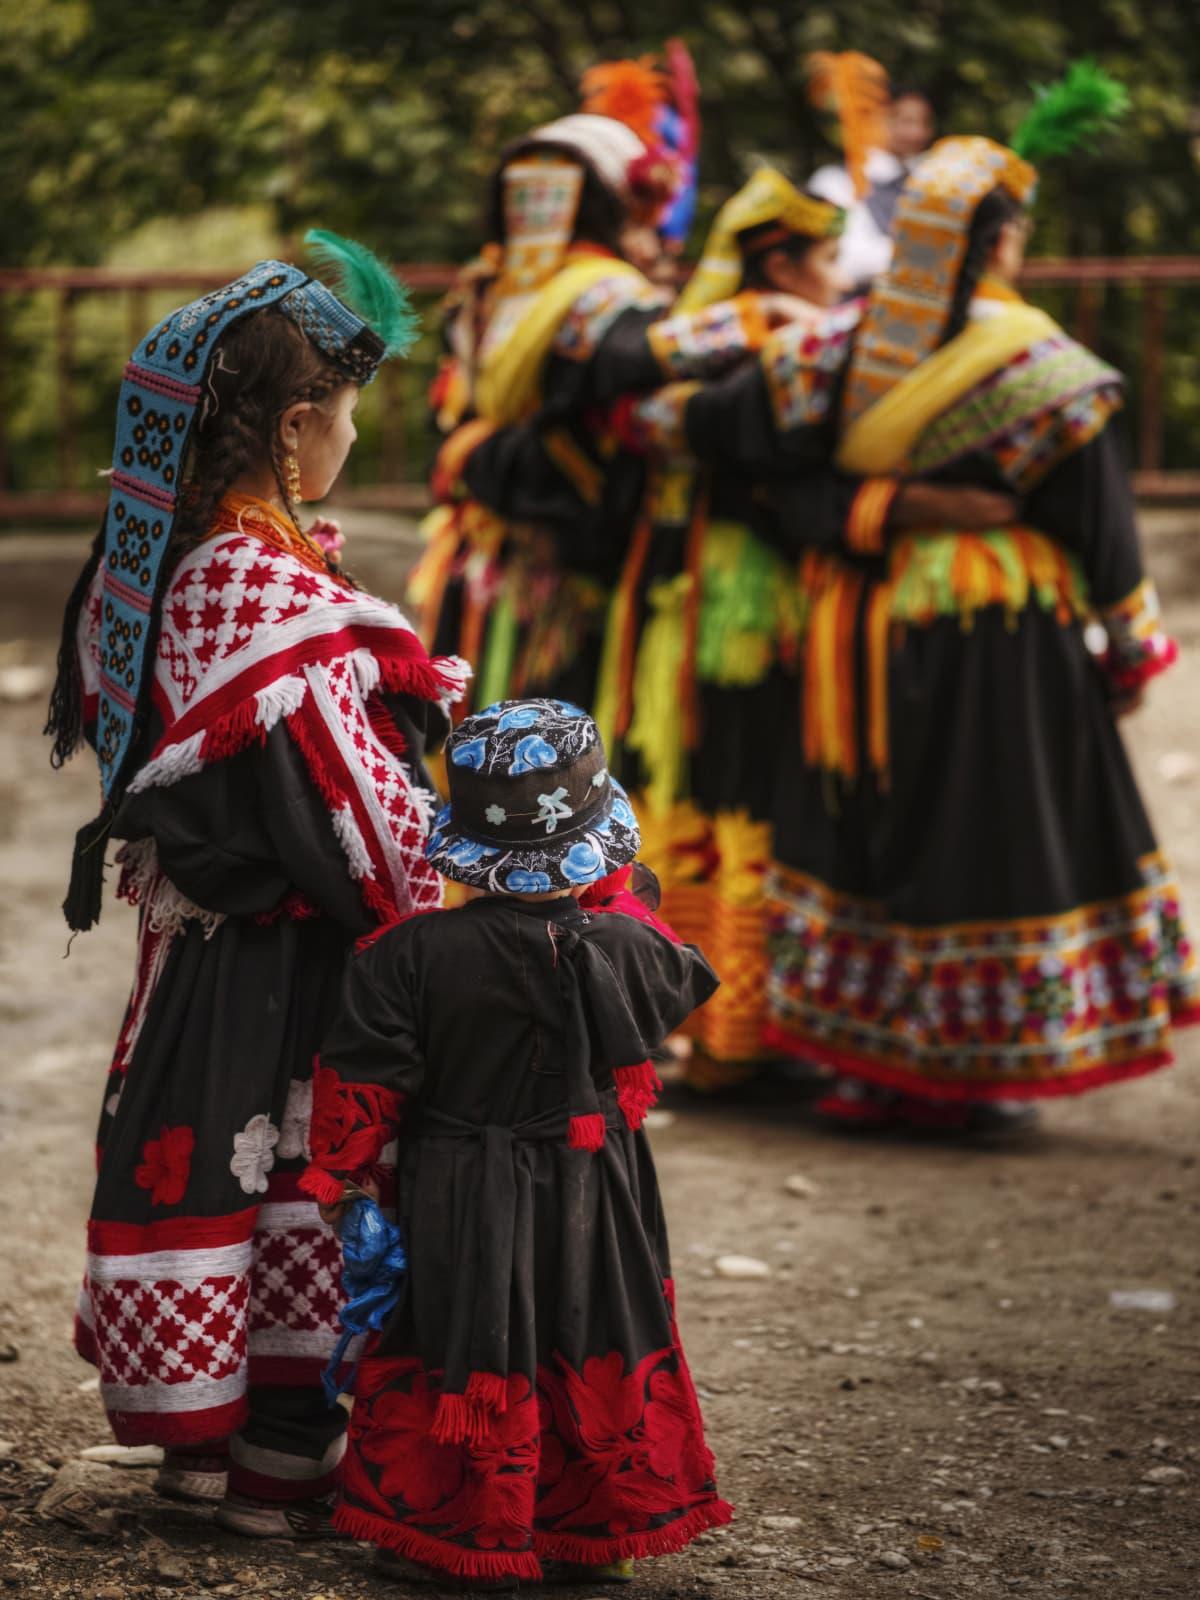 Children observe their elders perform a ritual dance